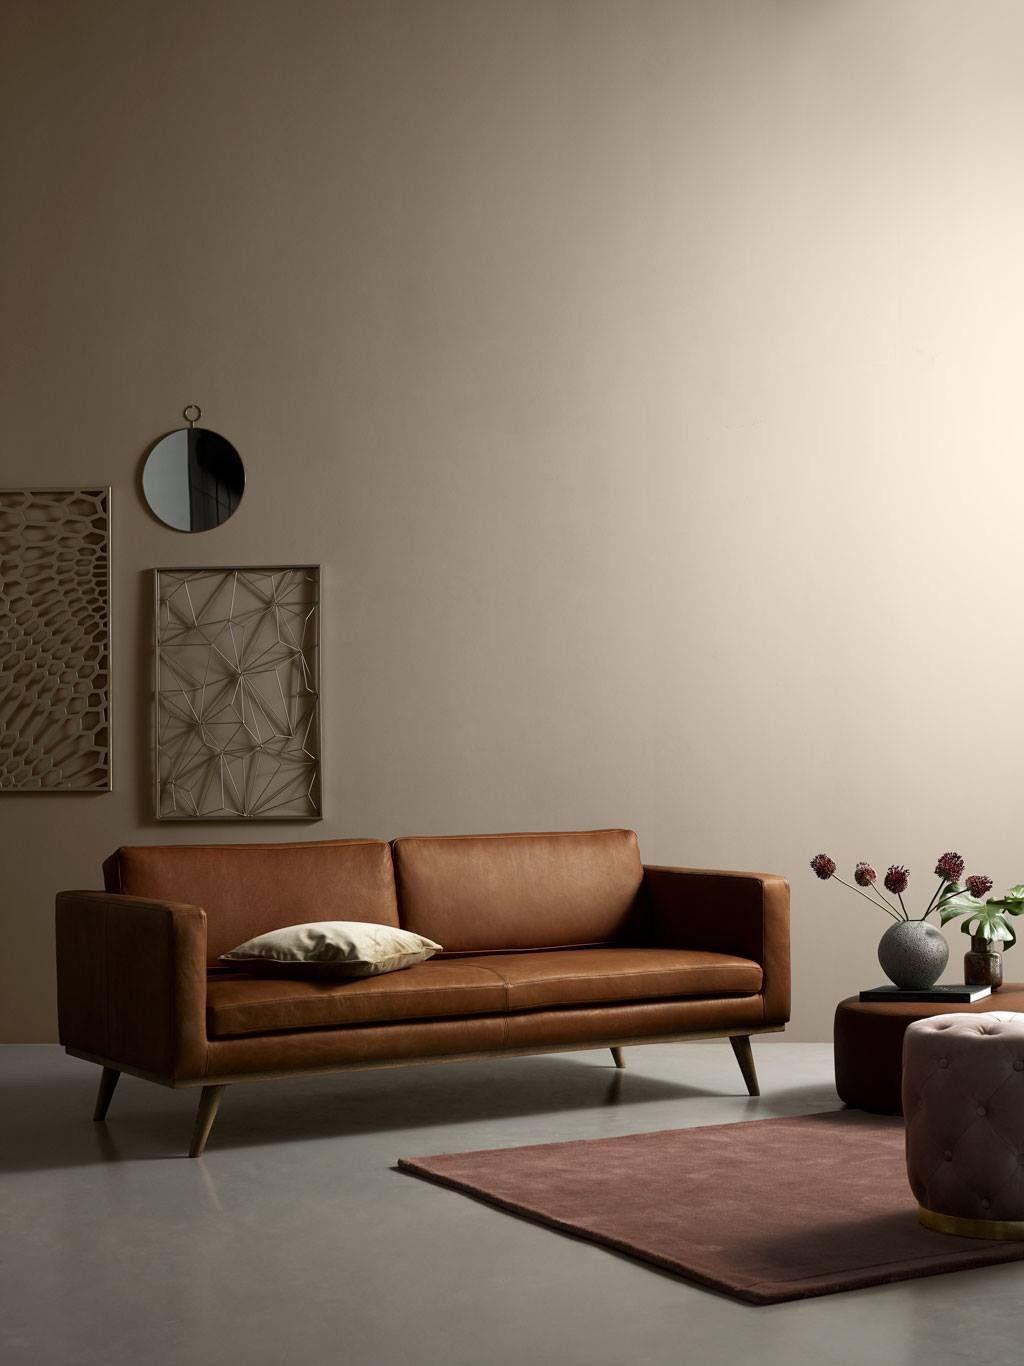 Johan Sofacompany Nl Ledersofa Design 3 Sitzer Sofa